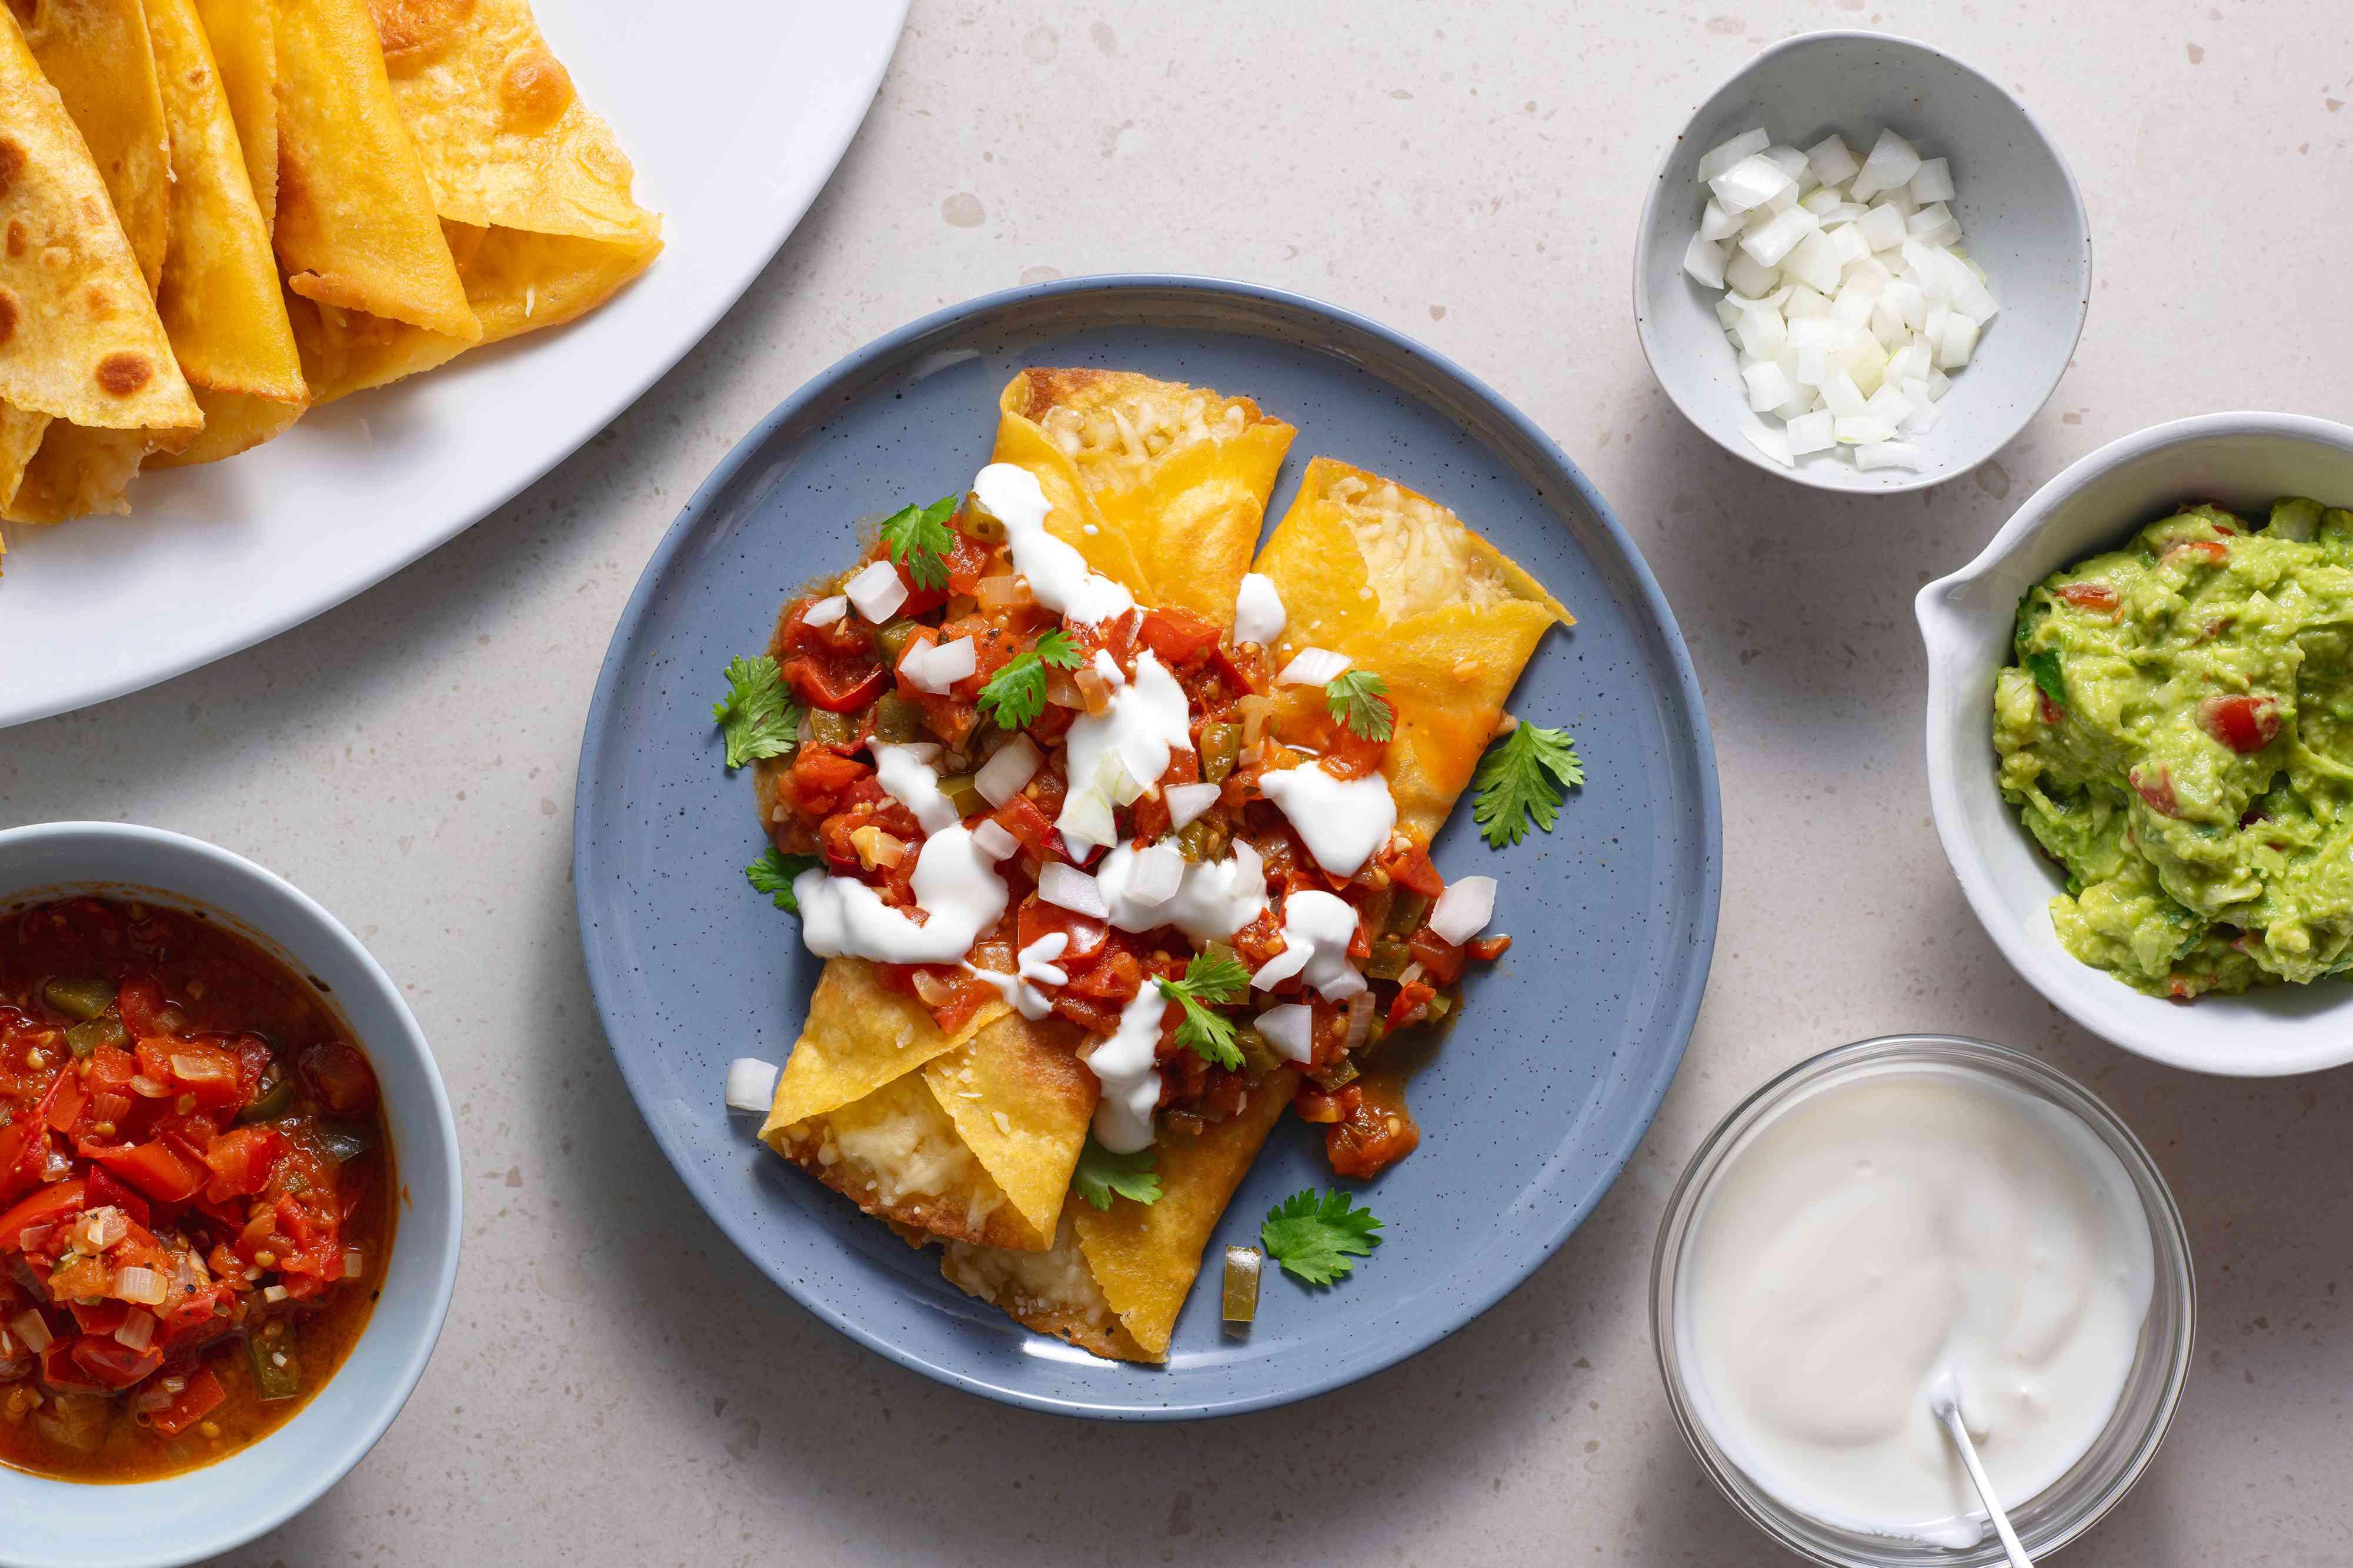 Enchiladas on a plate